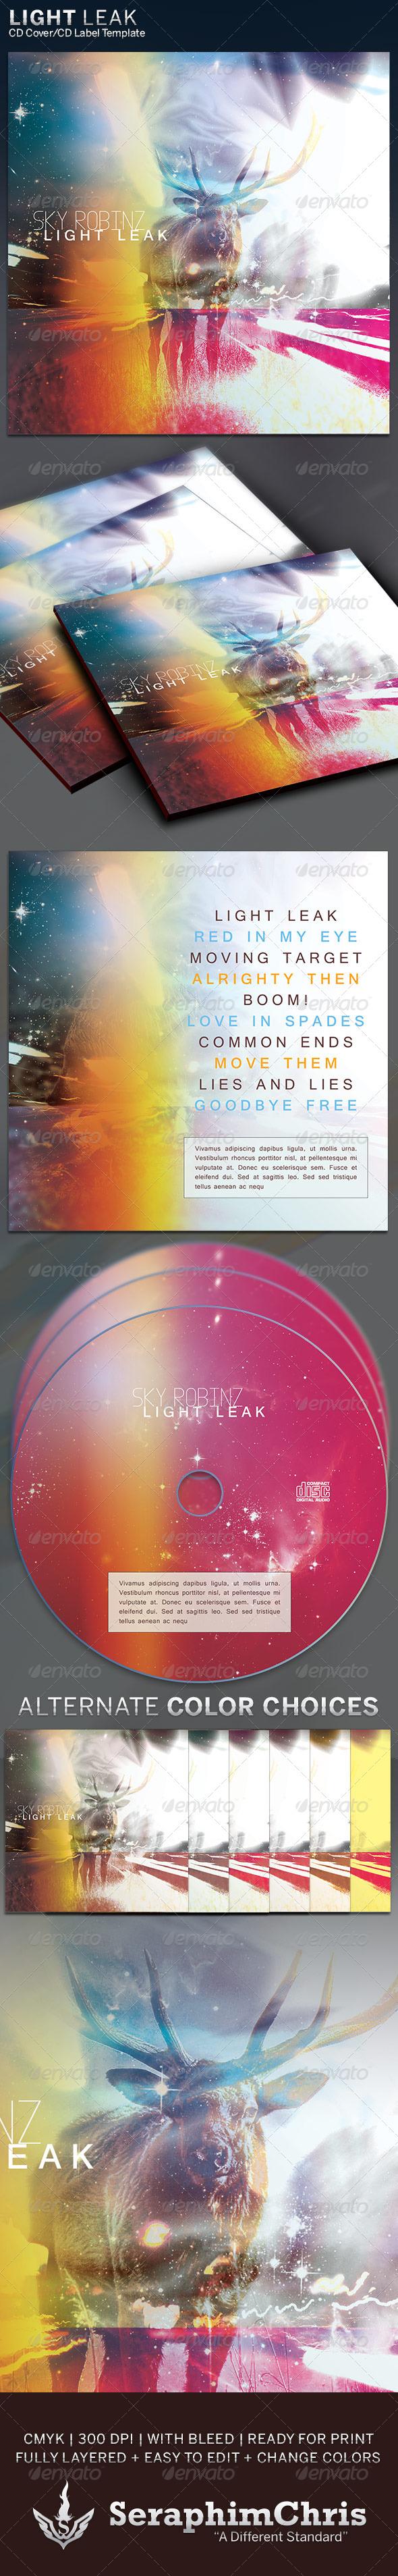 GraphicRiver Light Leak CD Cover Artwork Template 6312605